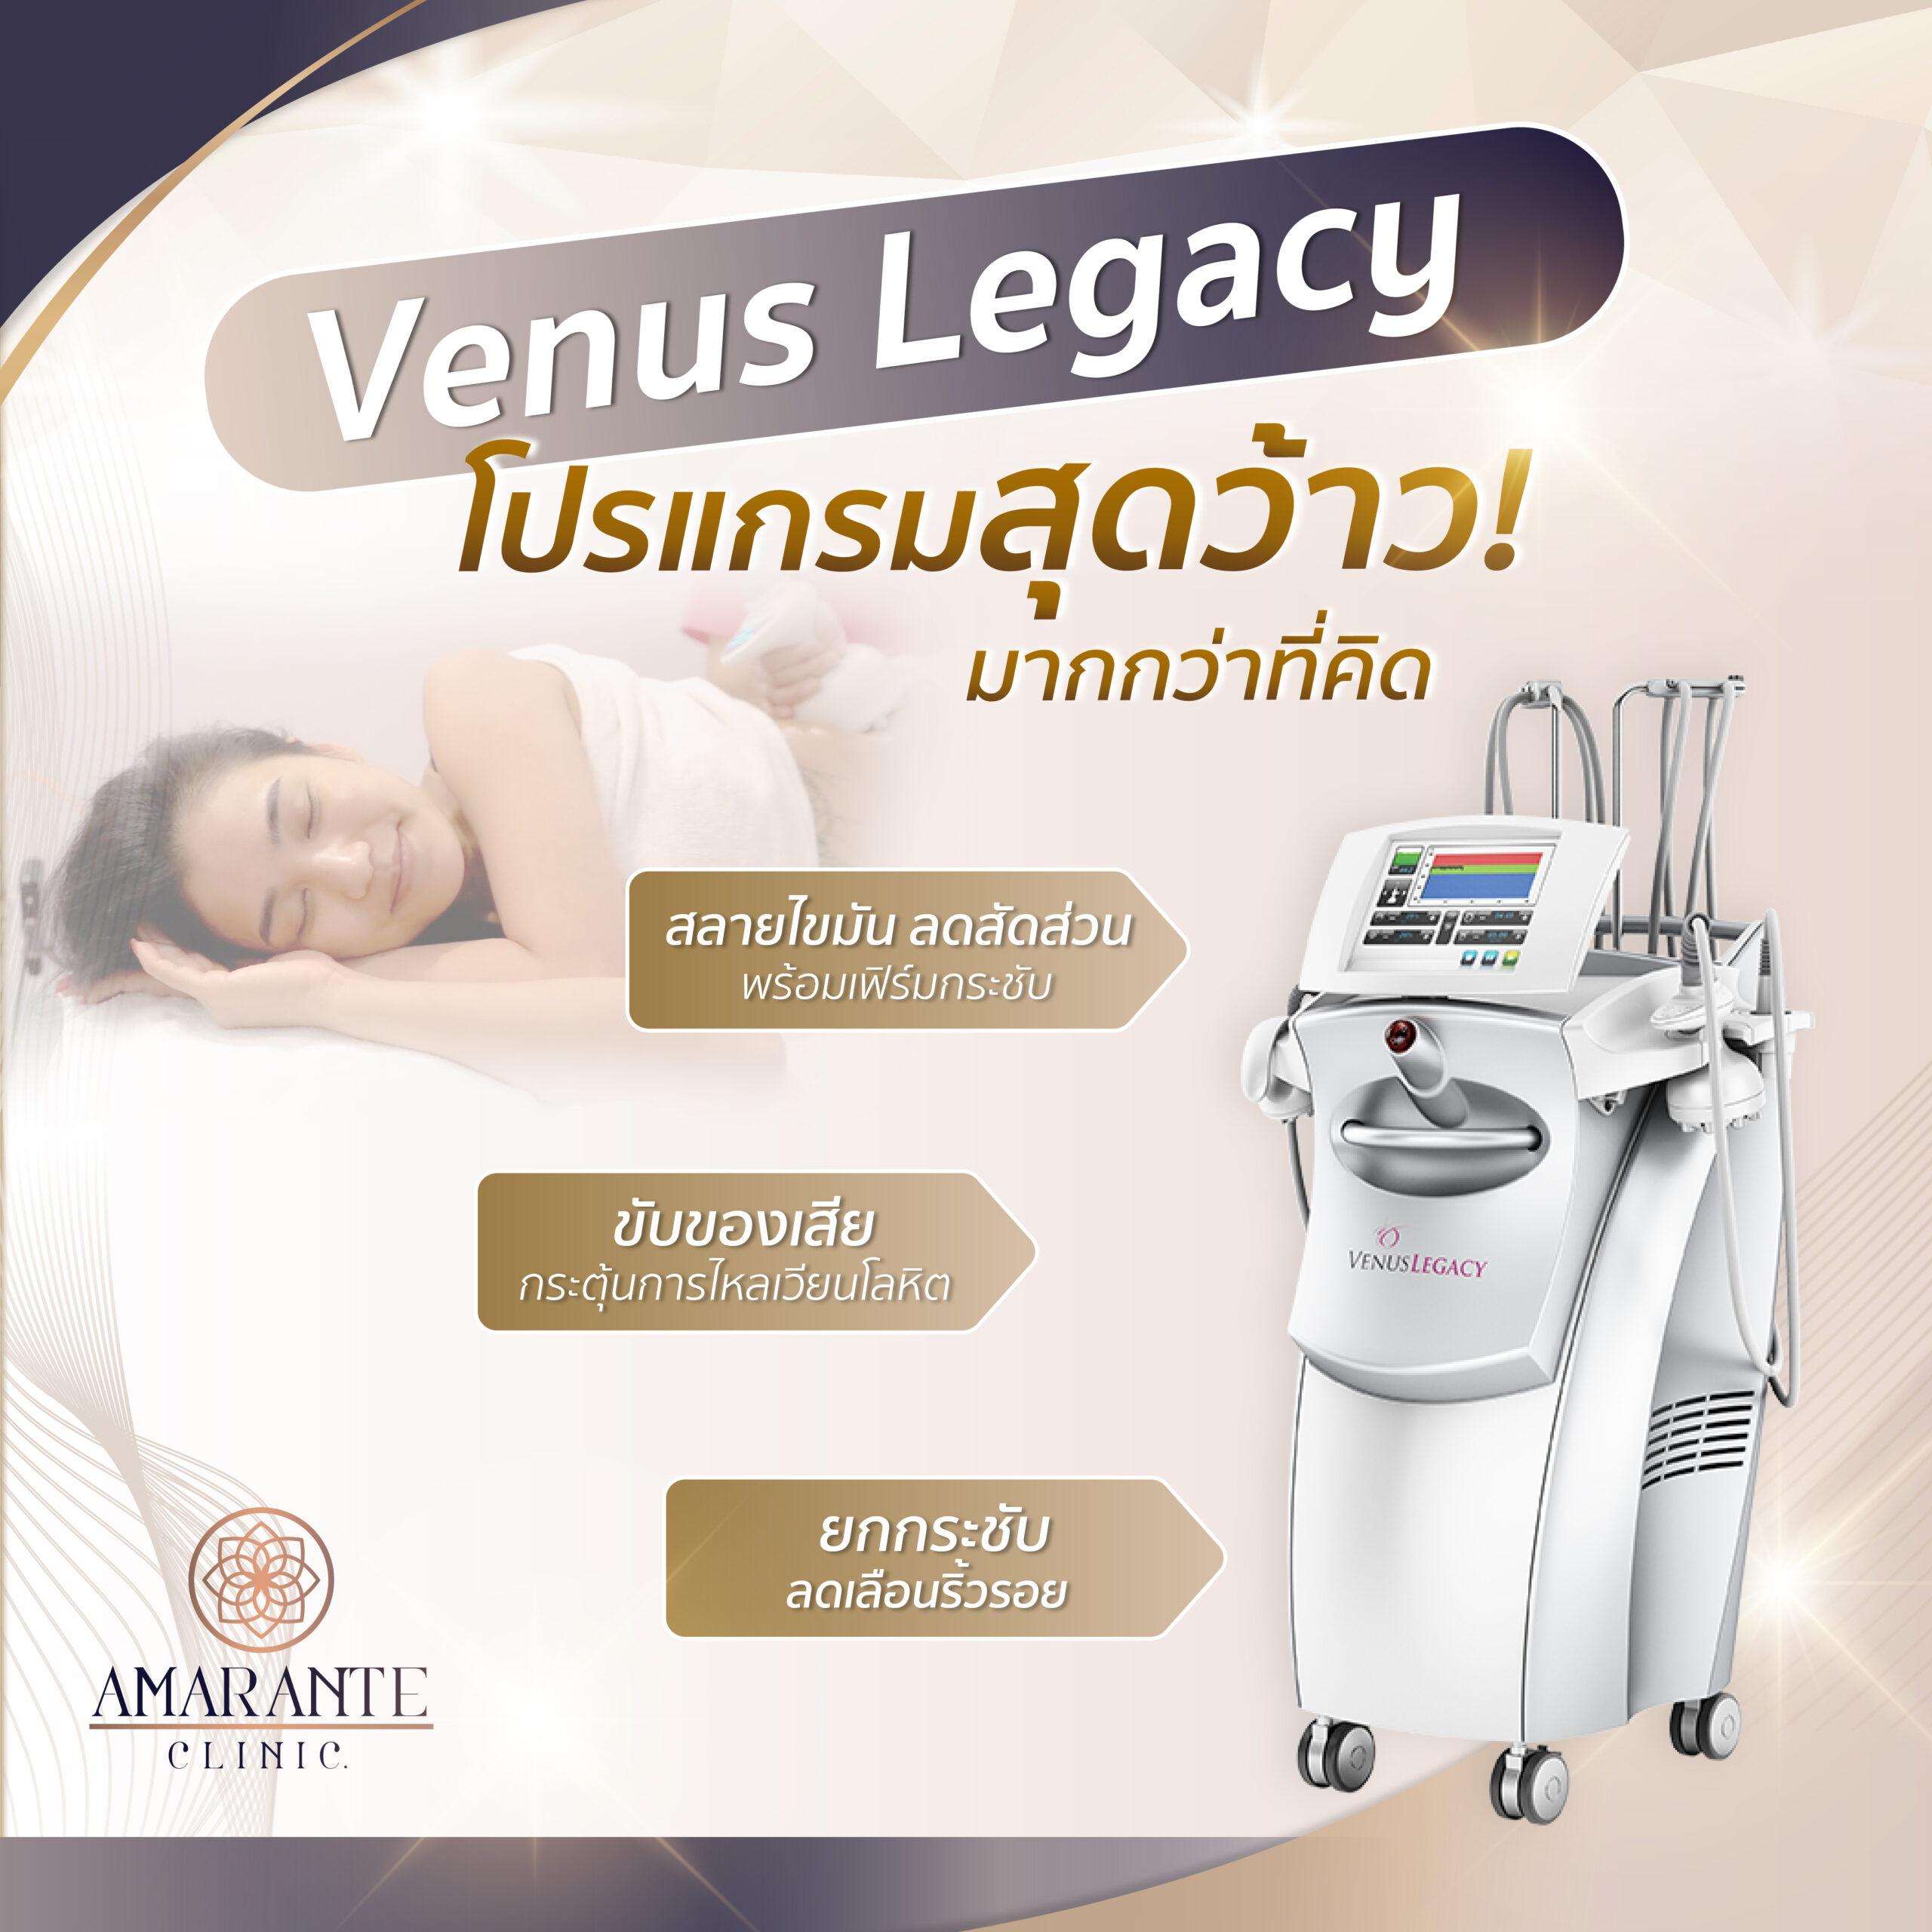 Venus Legacy สลายไขมัน ยกกระชับ ลดเรือนริ้วรอย